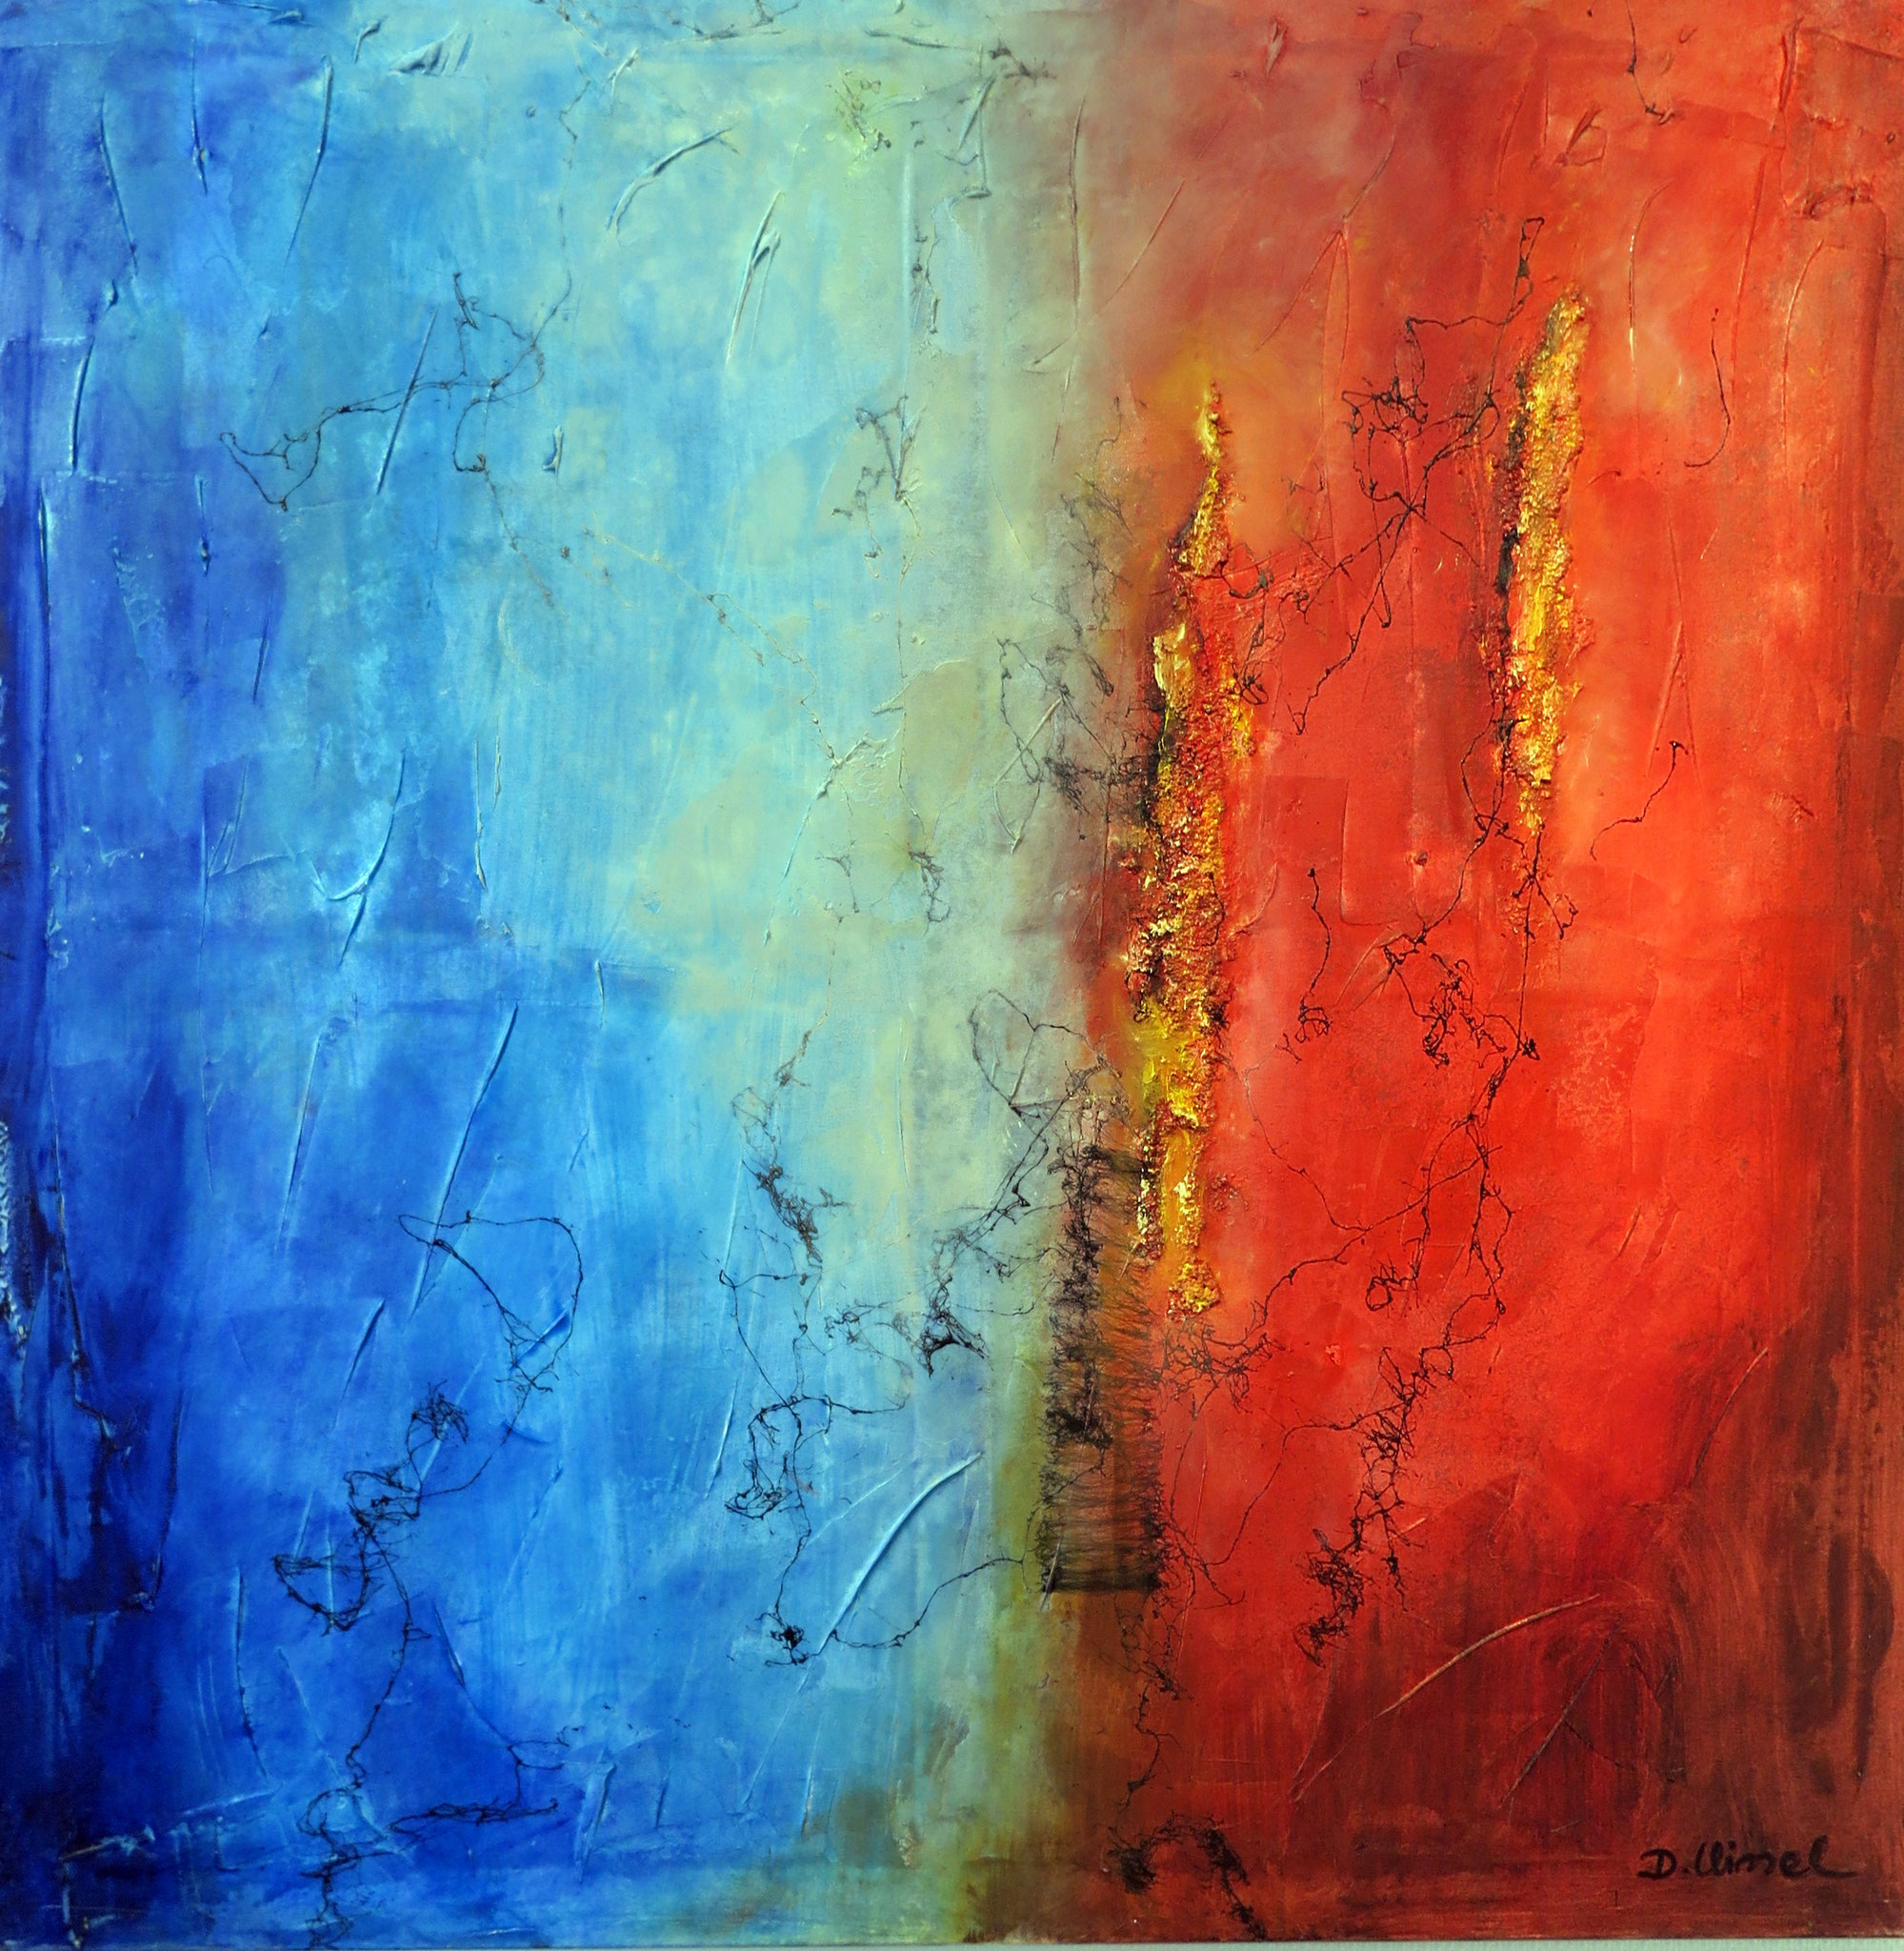 Rot-Blau 2 100 x 100 cm